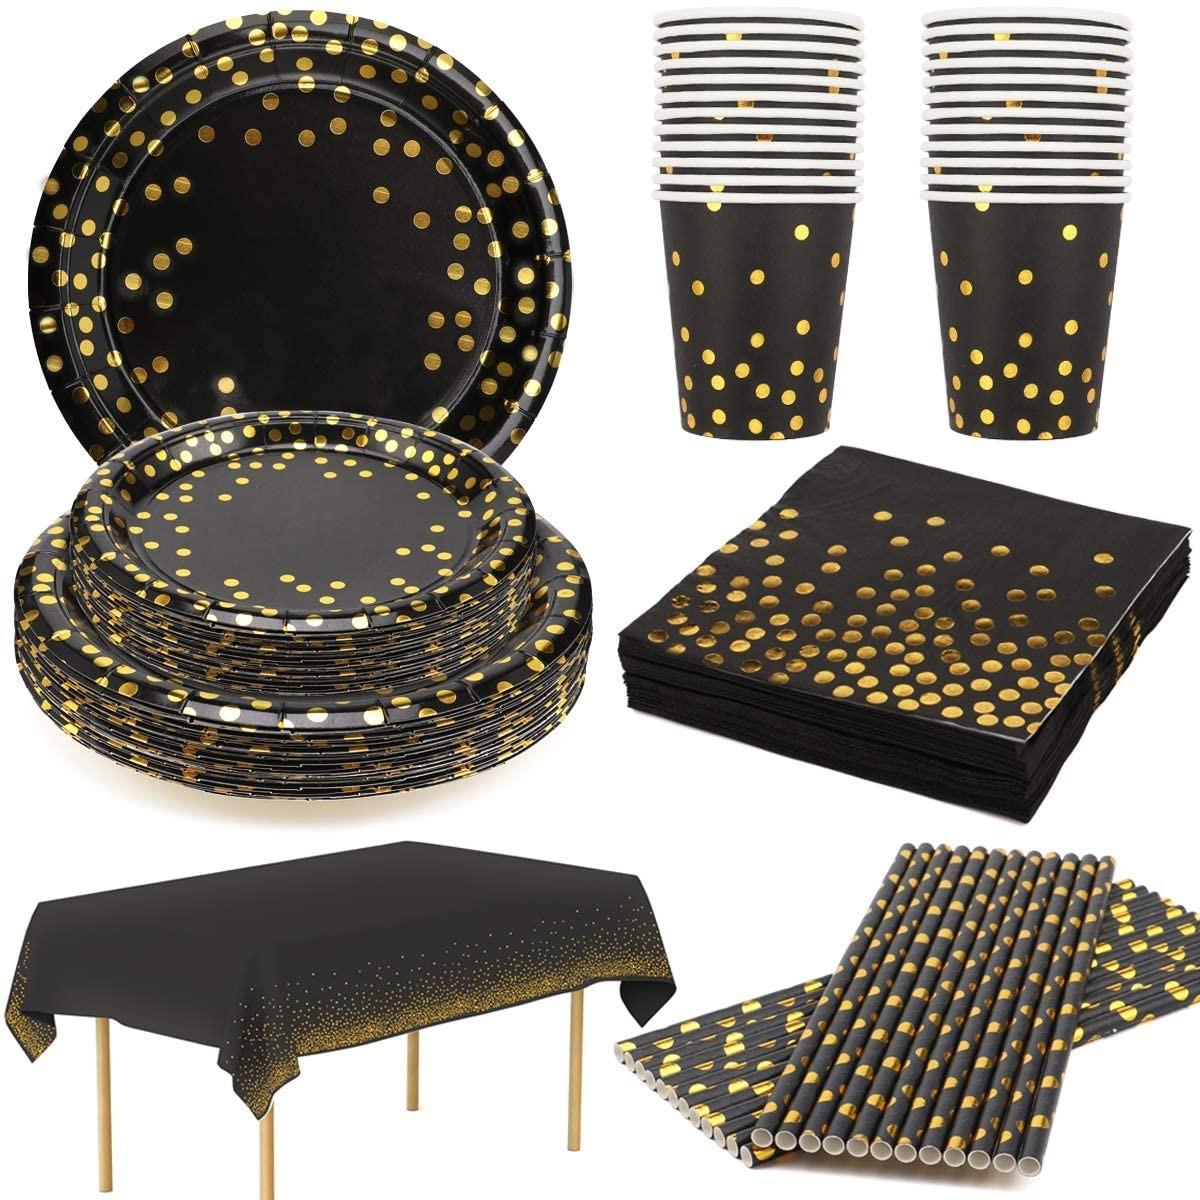 Kit festa 24 ospiti oro nero, festa Chic, set tavola